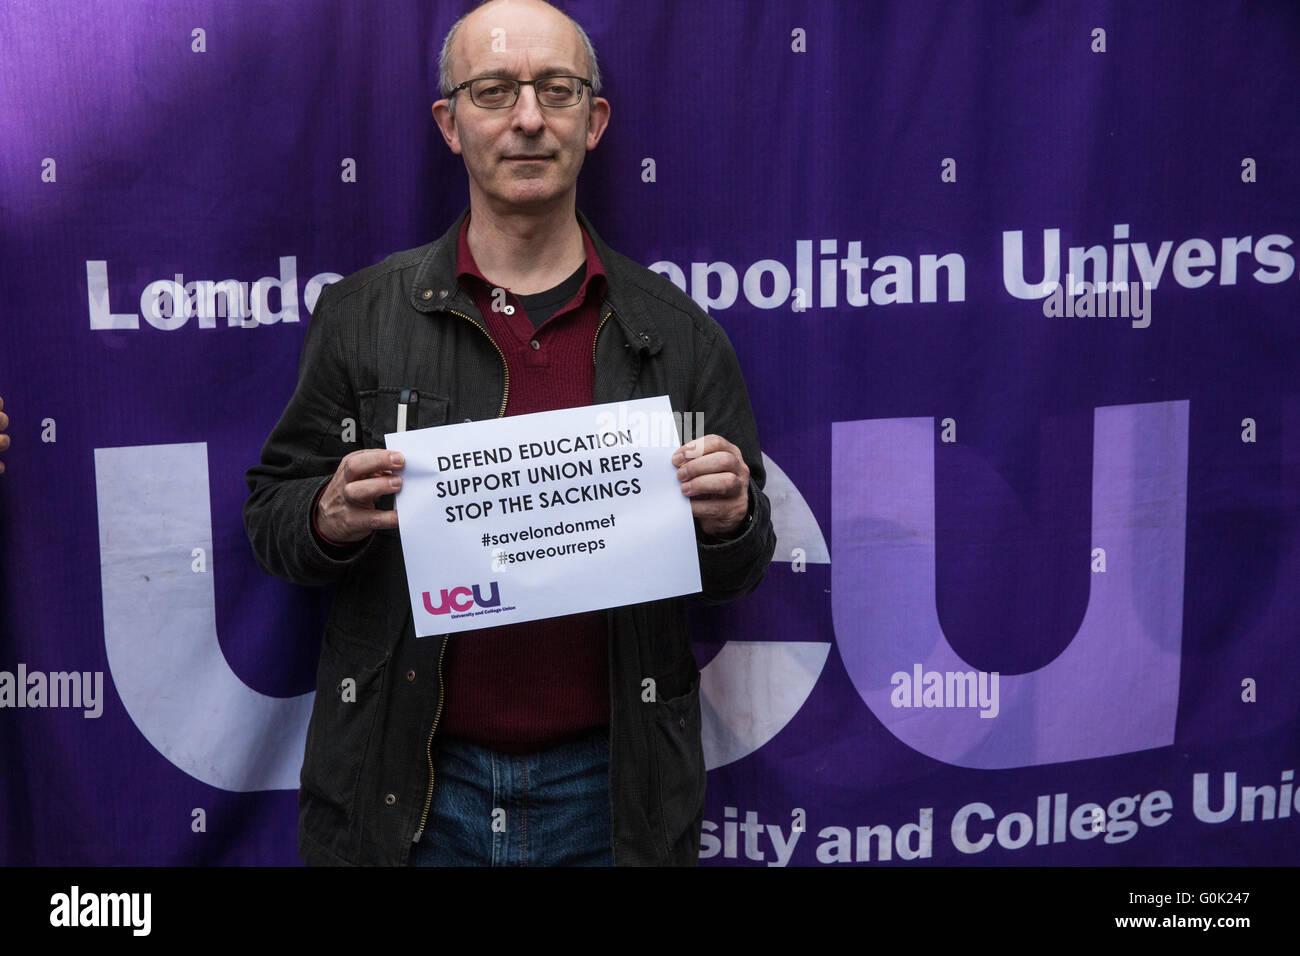 London, UK. 1st May, 2016. David Hardman, Principal Lecturer in the School of Psychology at London Metropolitan Stock Photo